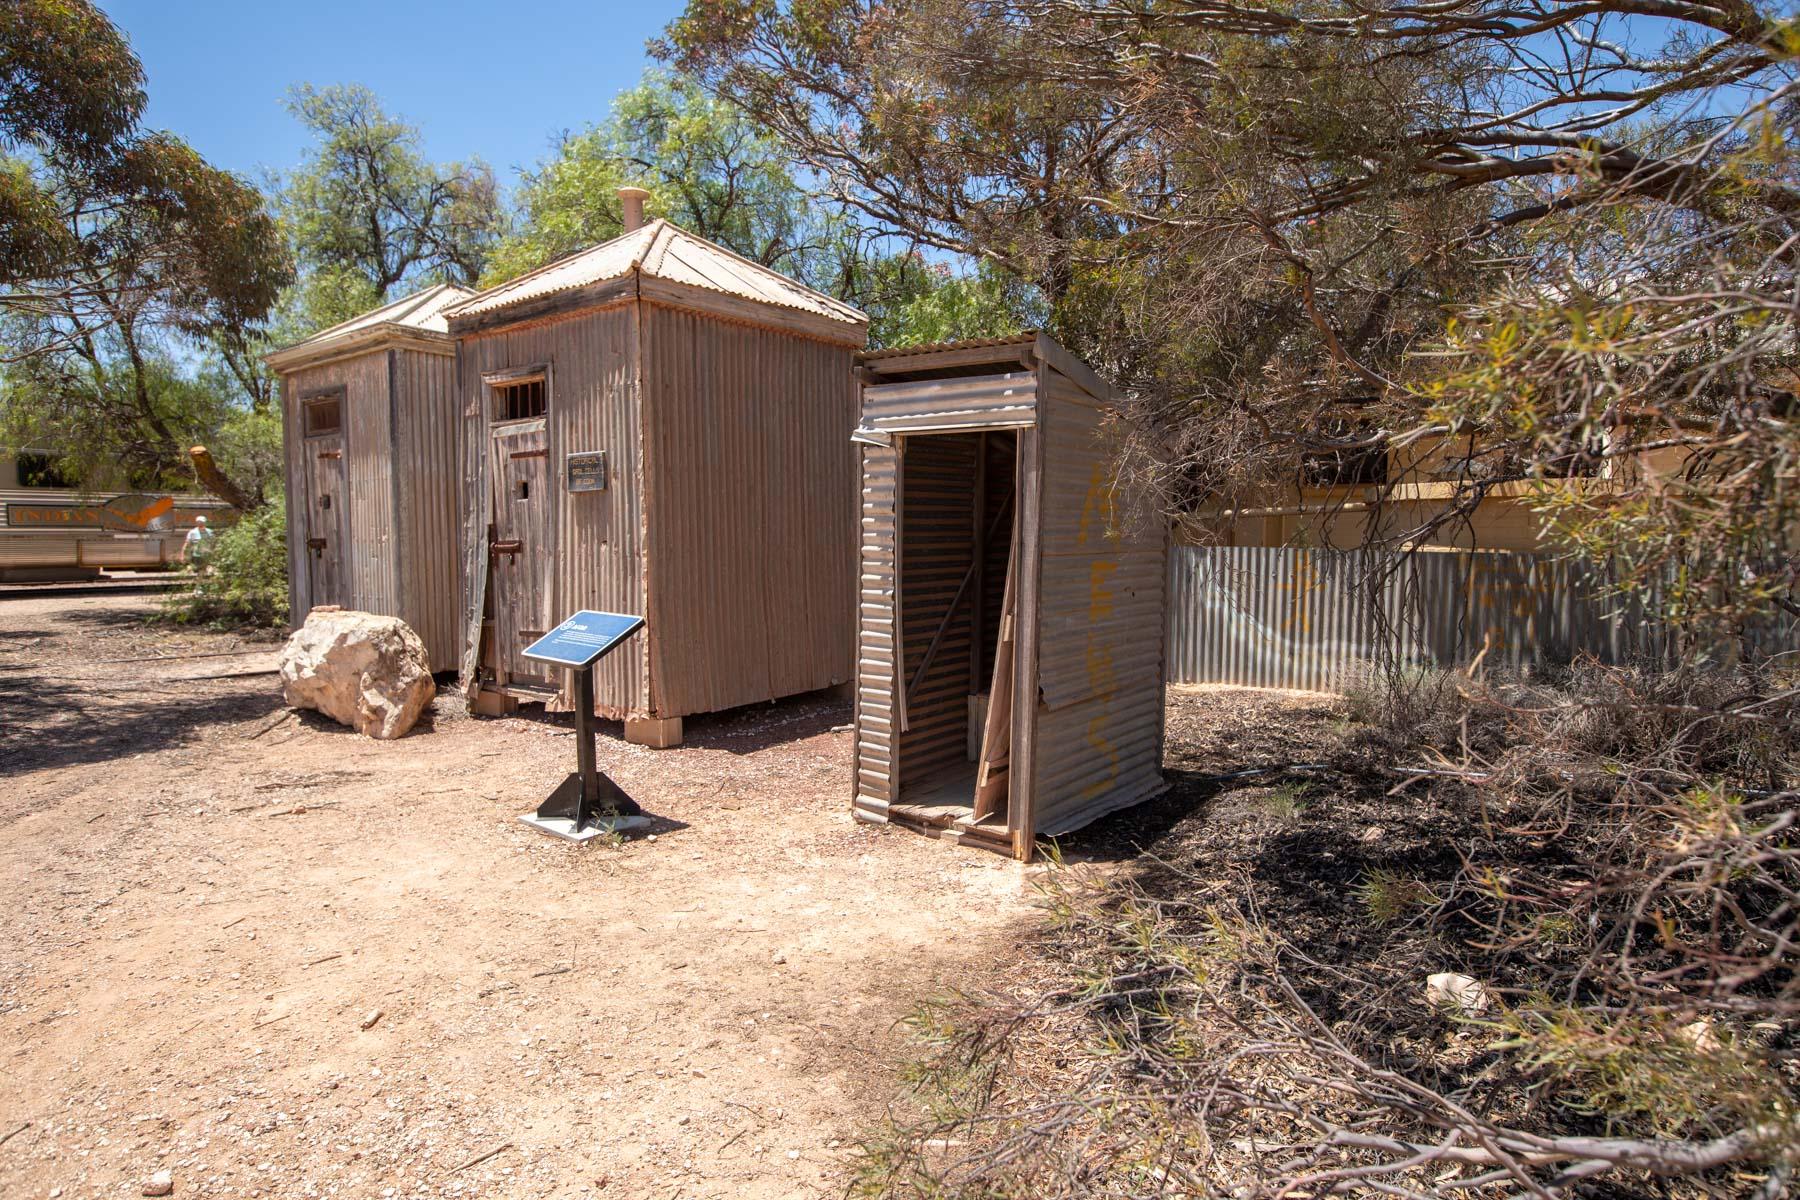 Police cells Cook Nallarbor, South Australia, Australia